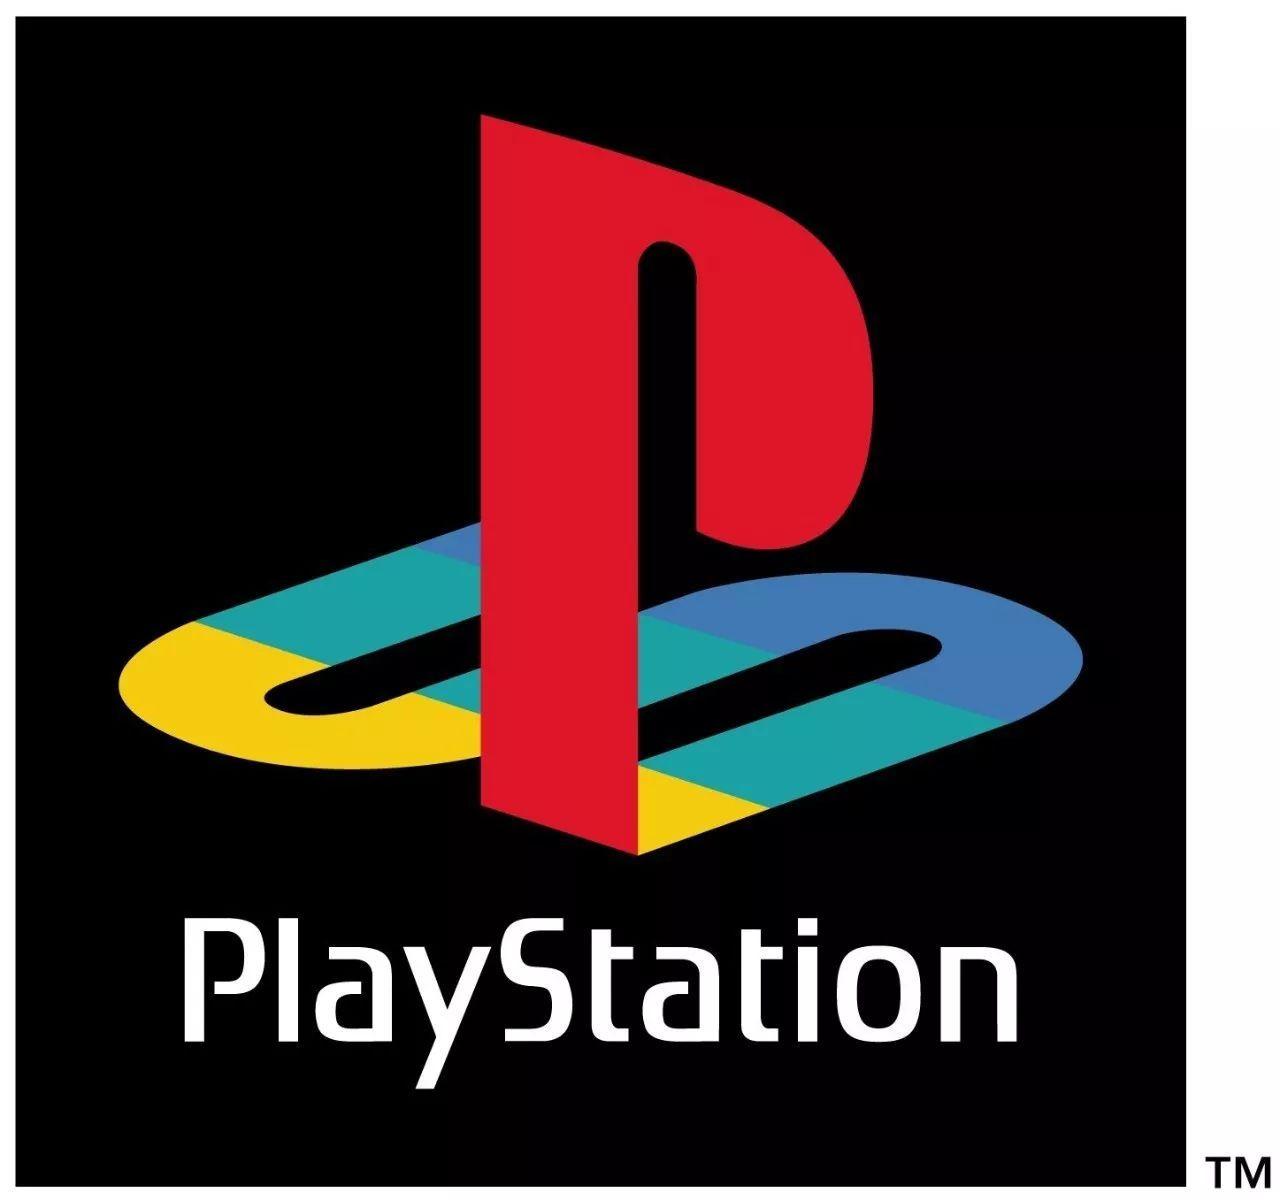 playstation是索尼旗下的索尼电脑娱乐scei家用电视游戏机